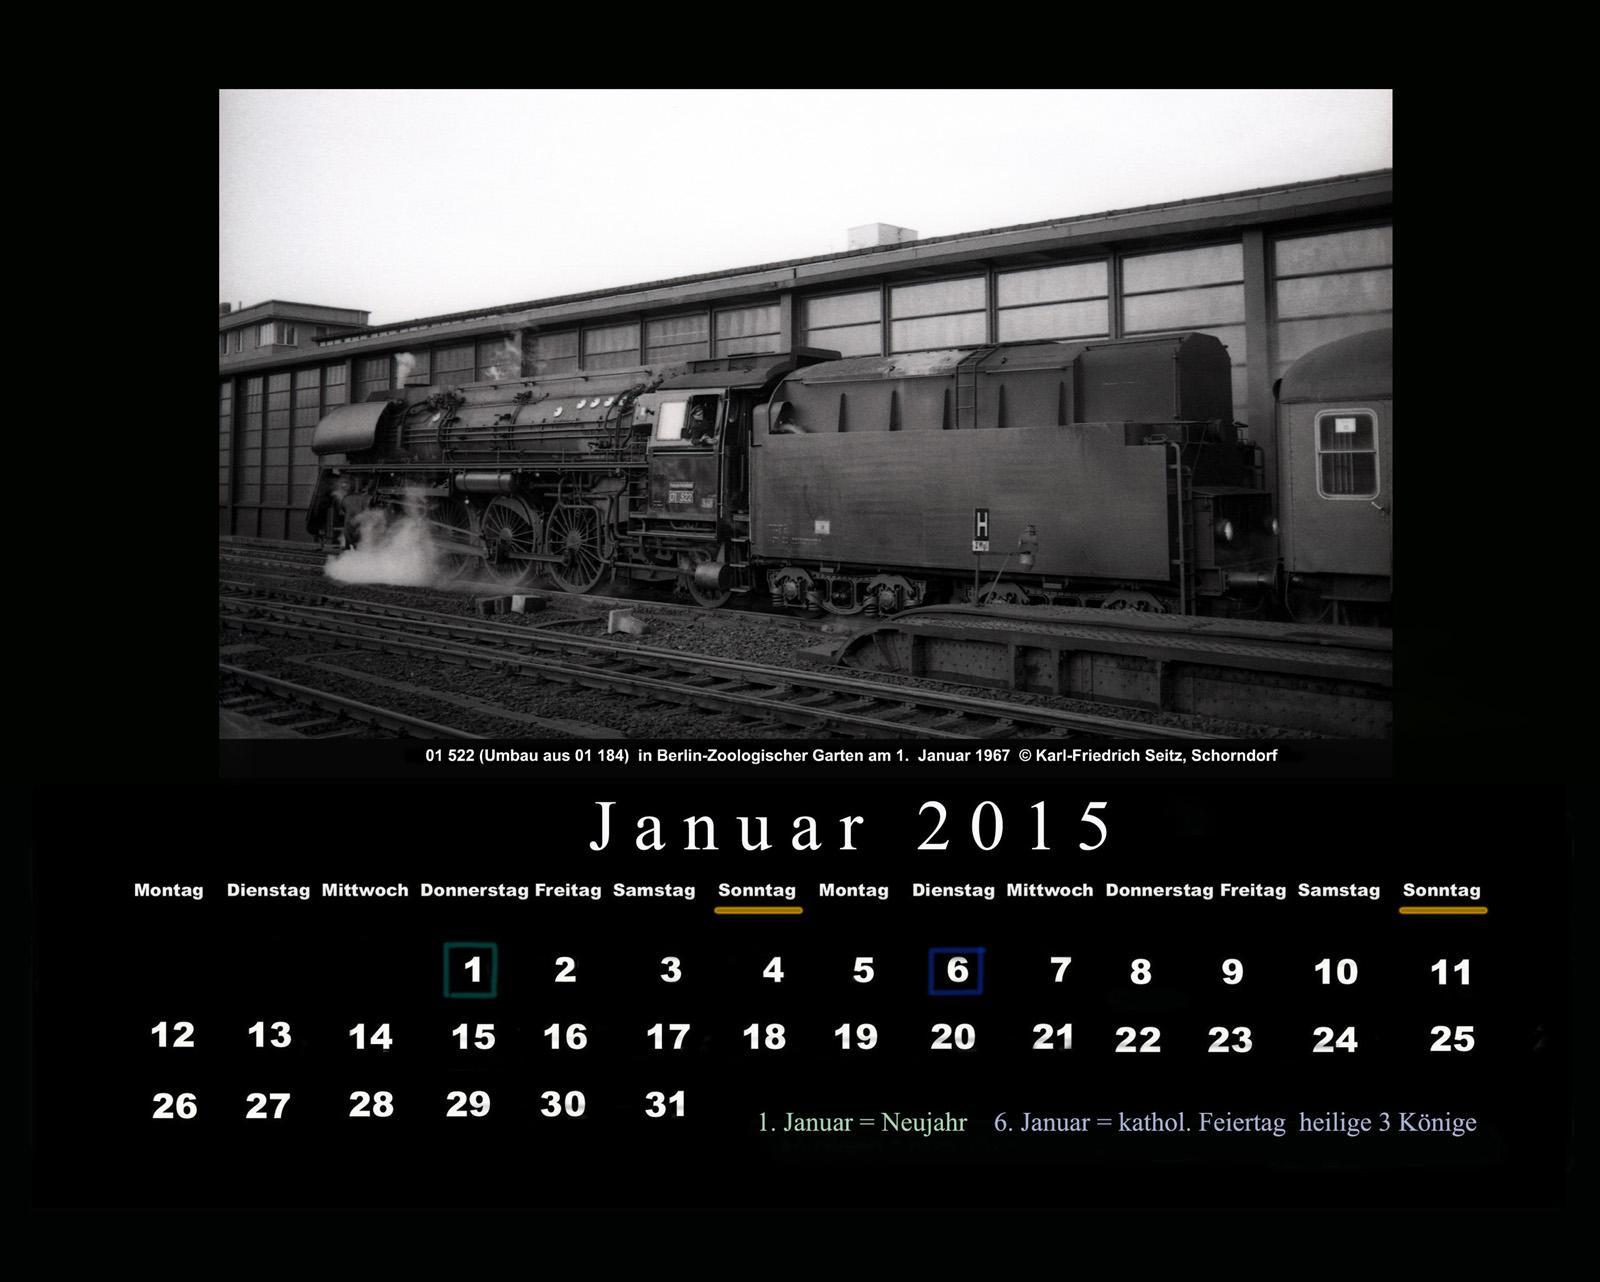 drehscheibe online foren 04 historische bahn dr 1967 01 01 kalender januar 2015 berlin. Black Bedroom Furniture Sets. Home Design Ideas